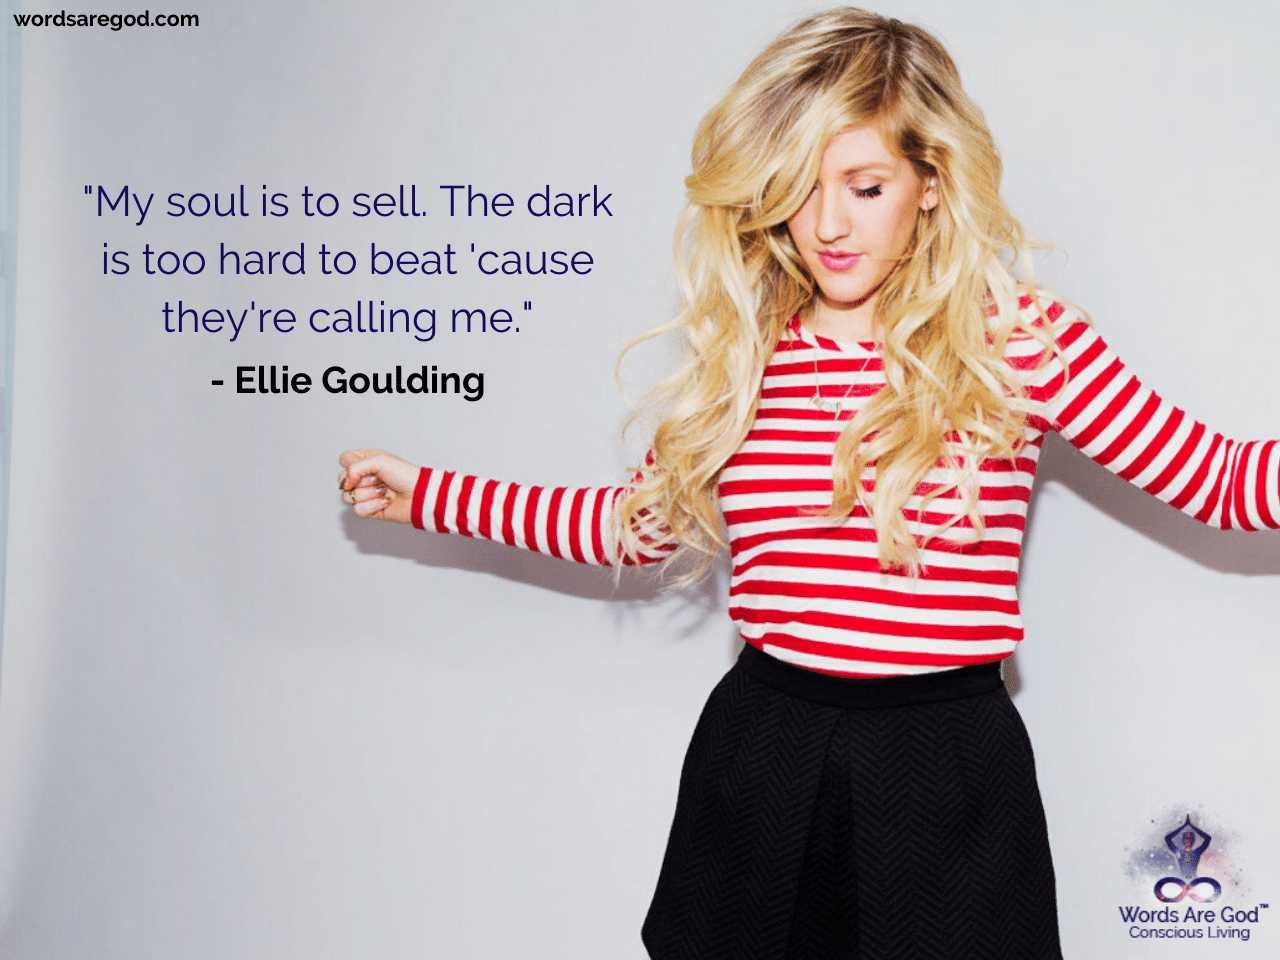 Ellie Goulding Best Quotes by Ellie Goulding